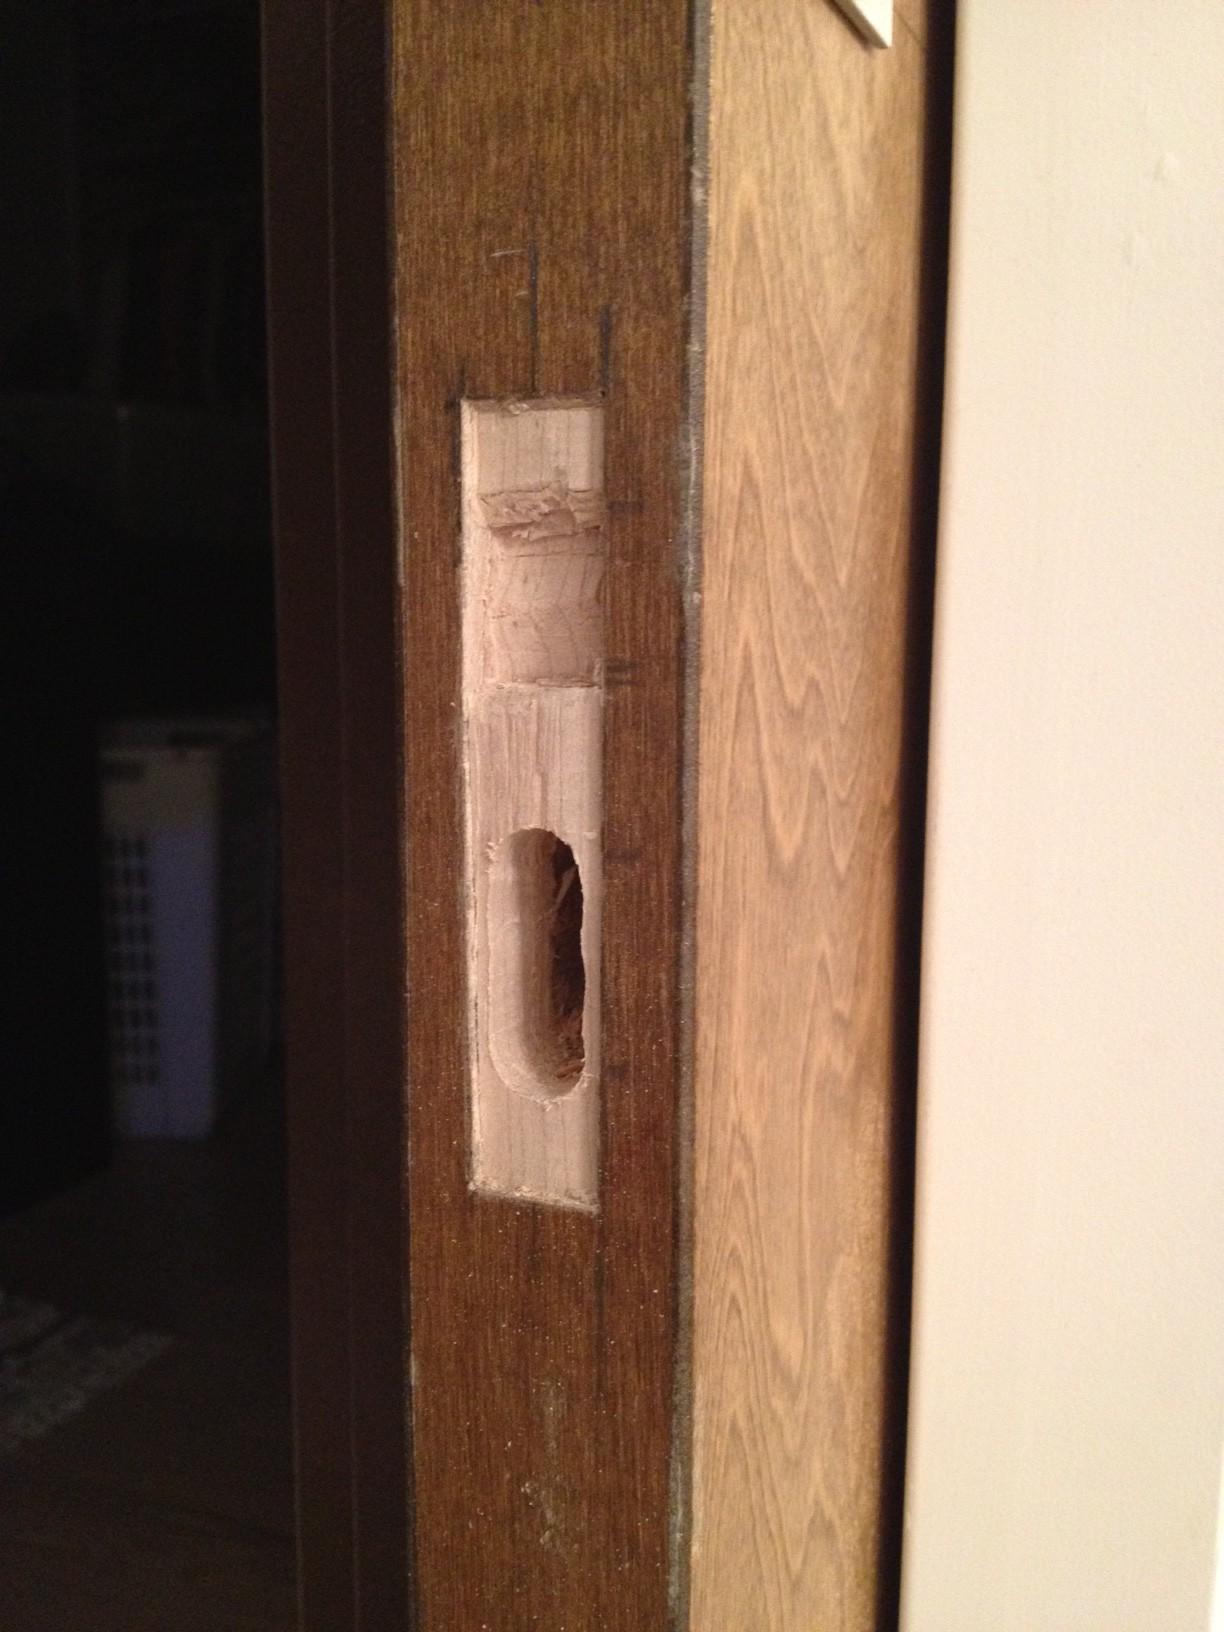 Installing And Emtek Edge Pull Step 4